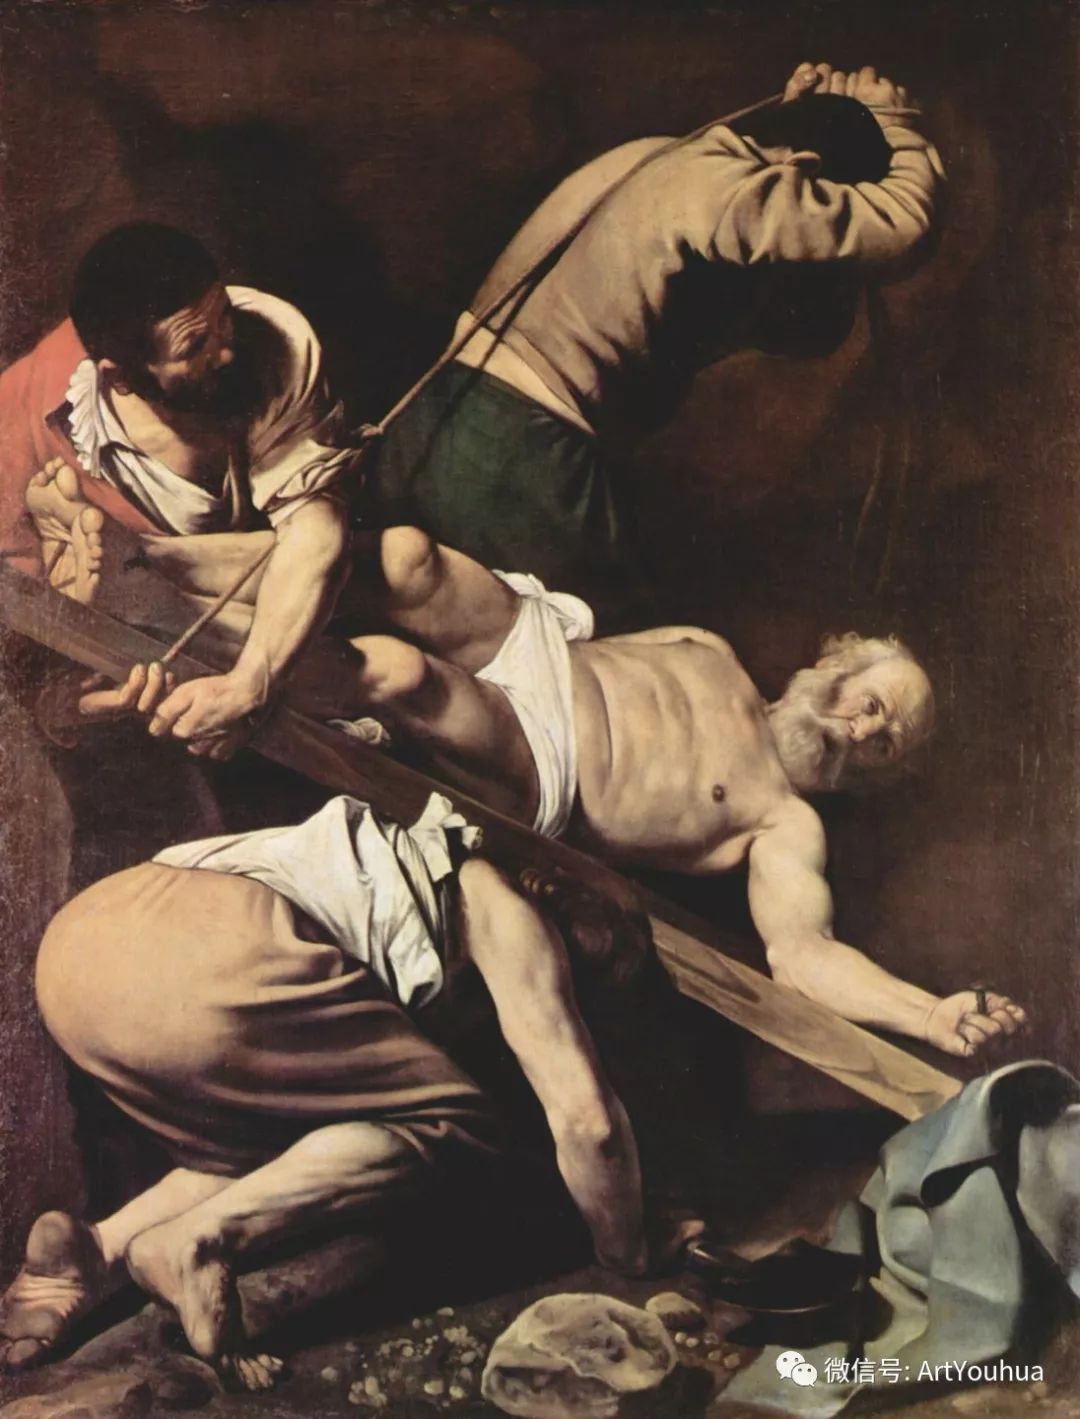 No.18 卡拉瓦乔 | 意大利16世纪末至17世纪初的著名画家插图73